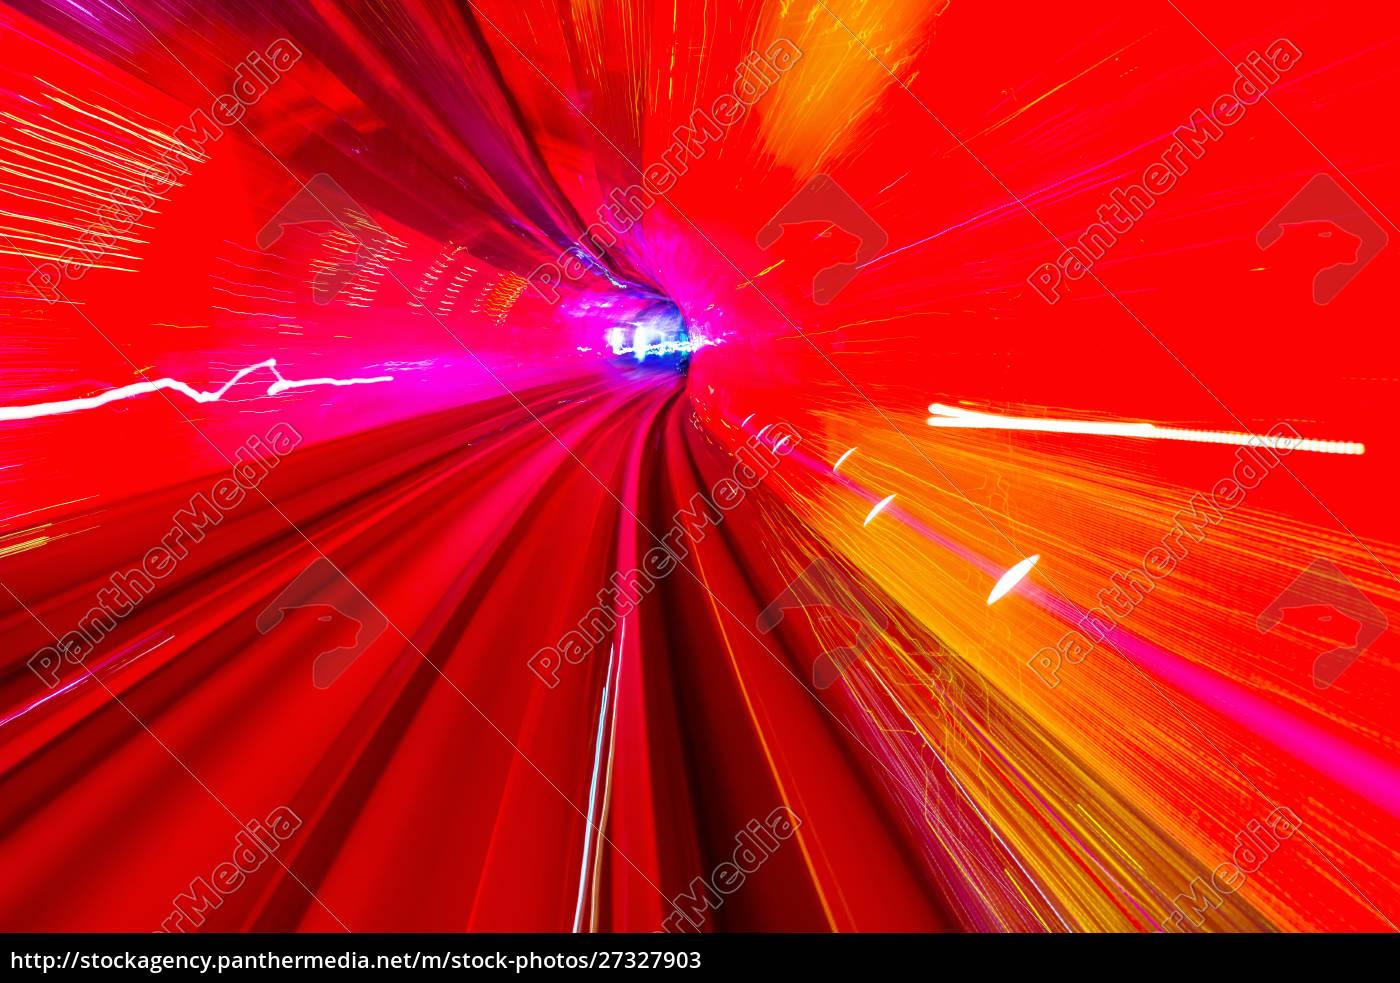 red, yellow, rail, abstract, underground, railway - 27327903